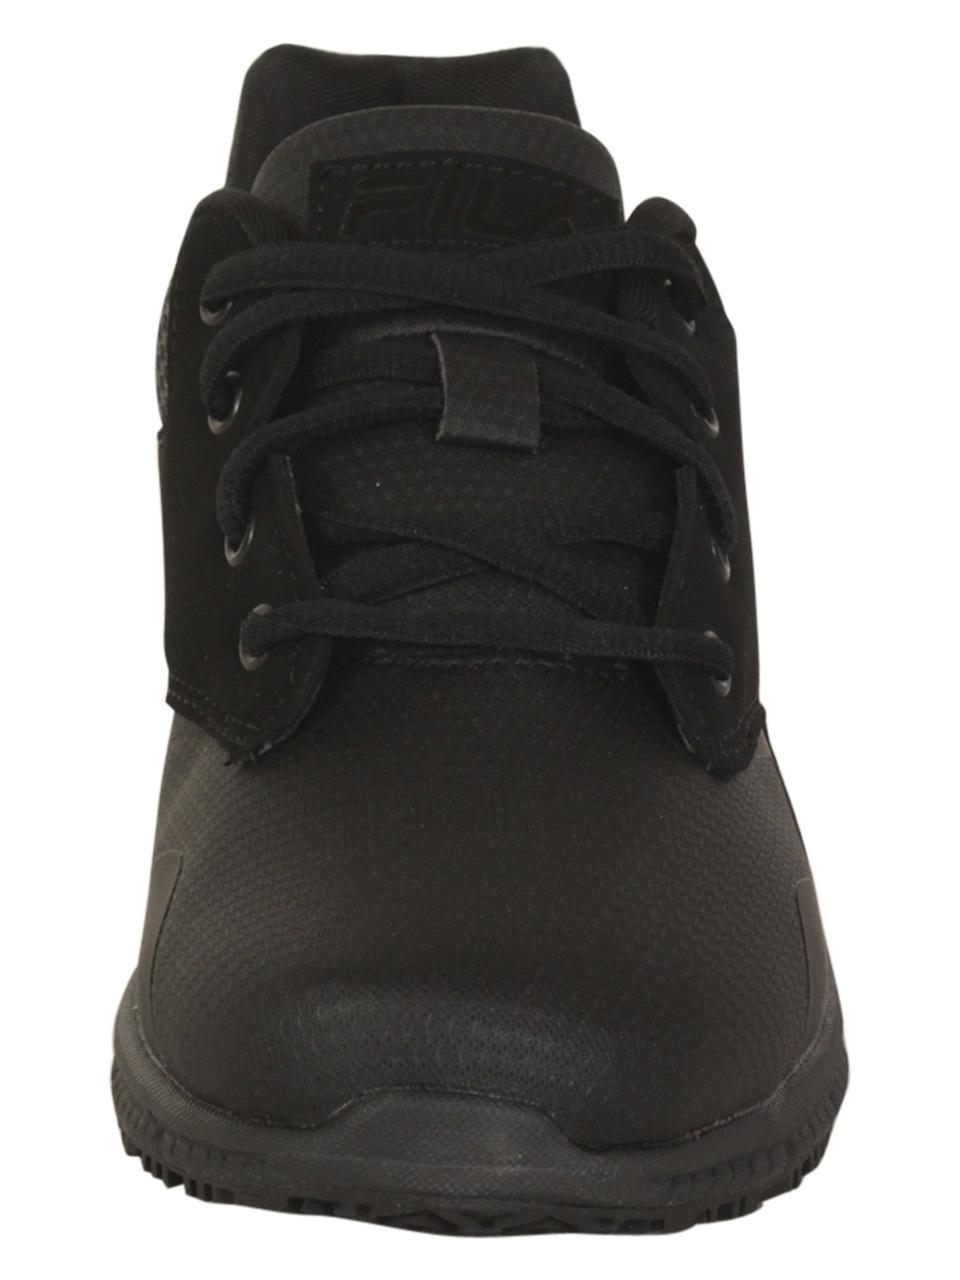 05a49852 fila slip resistant memory foam shoes fashion